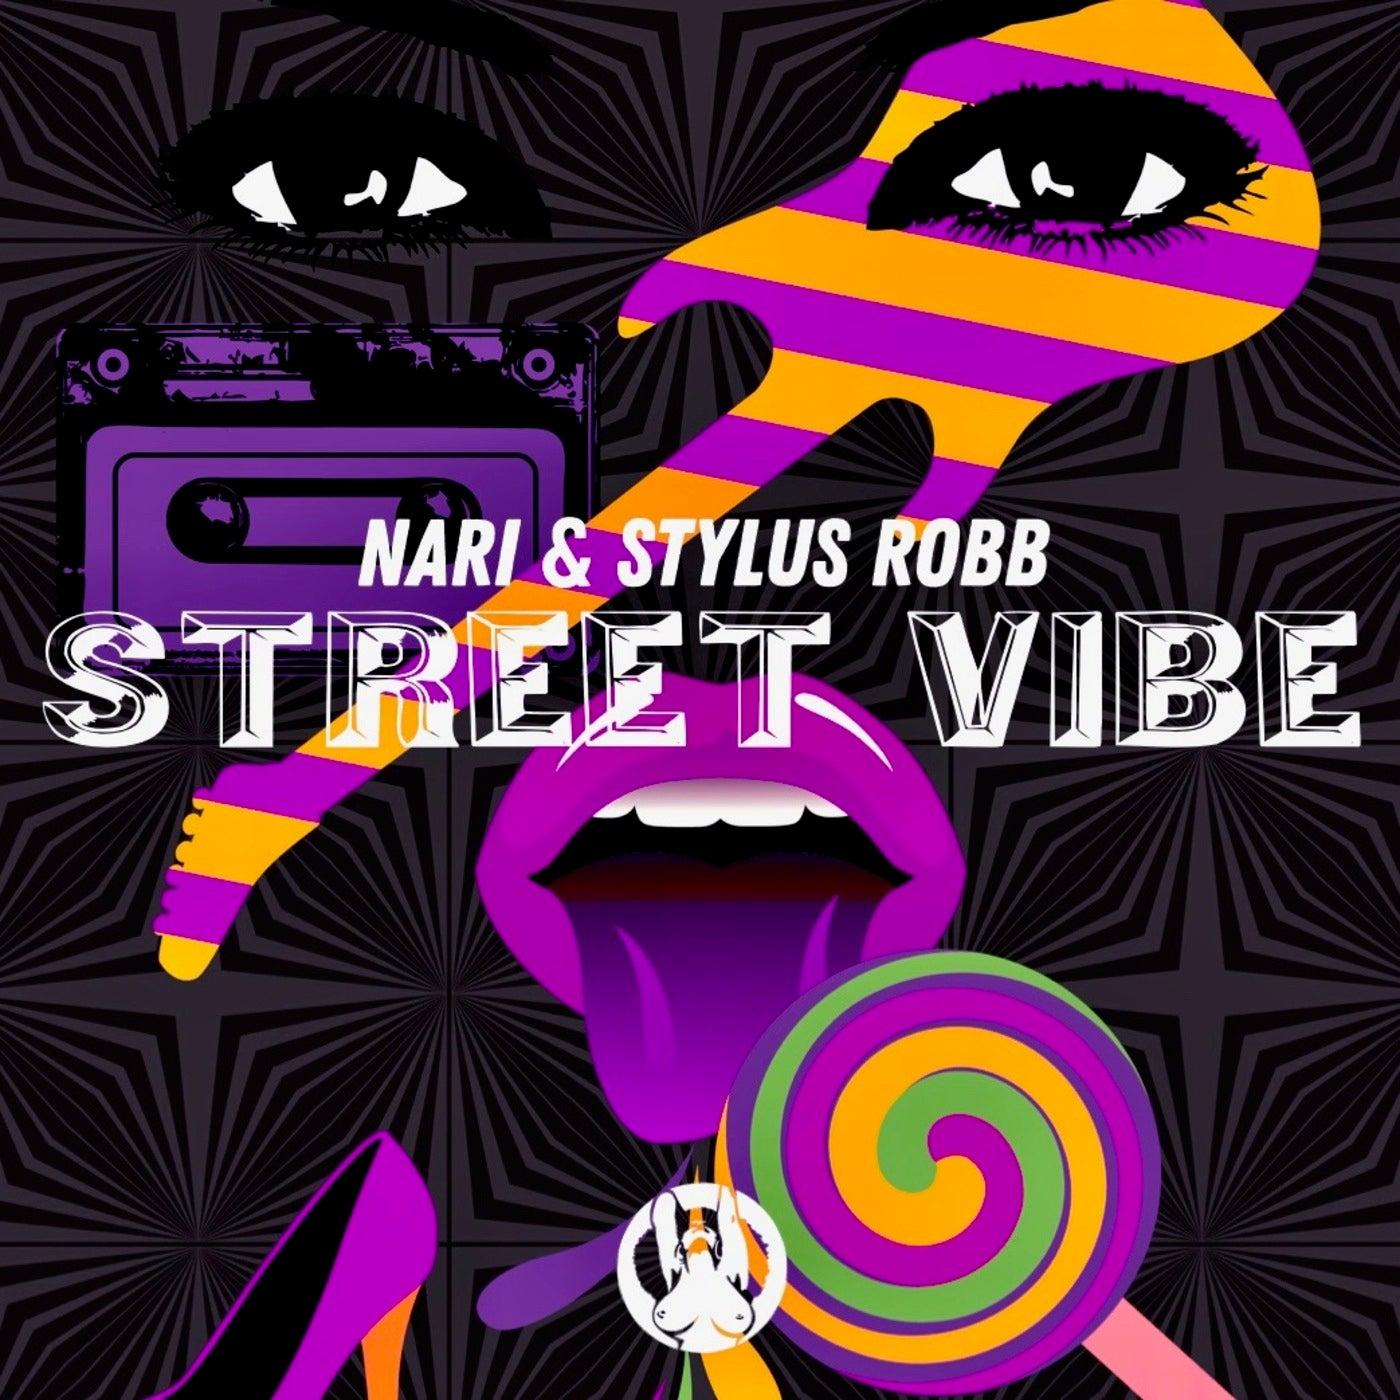 Street Vibe (Original Mix)